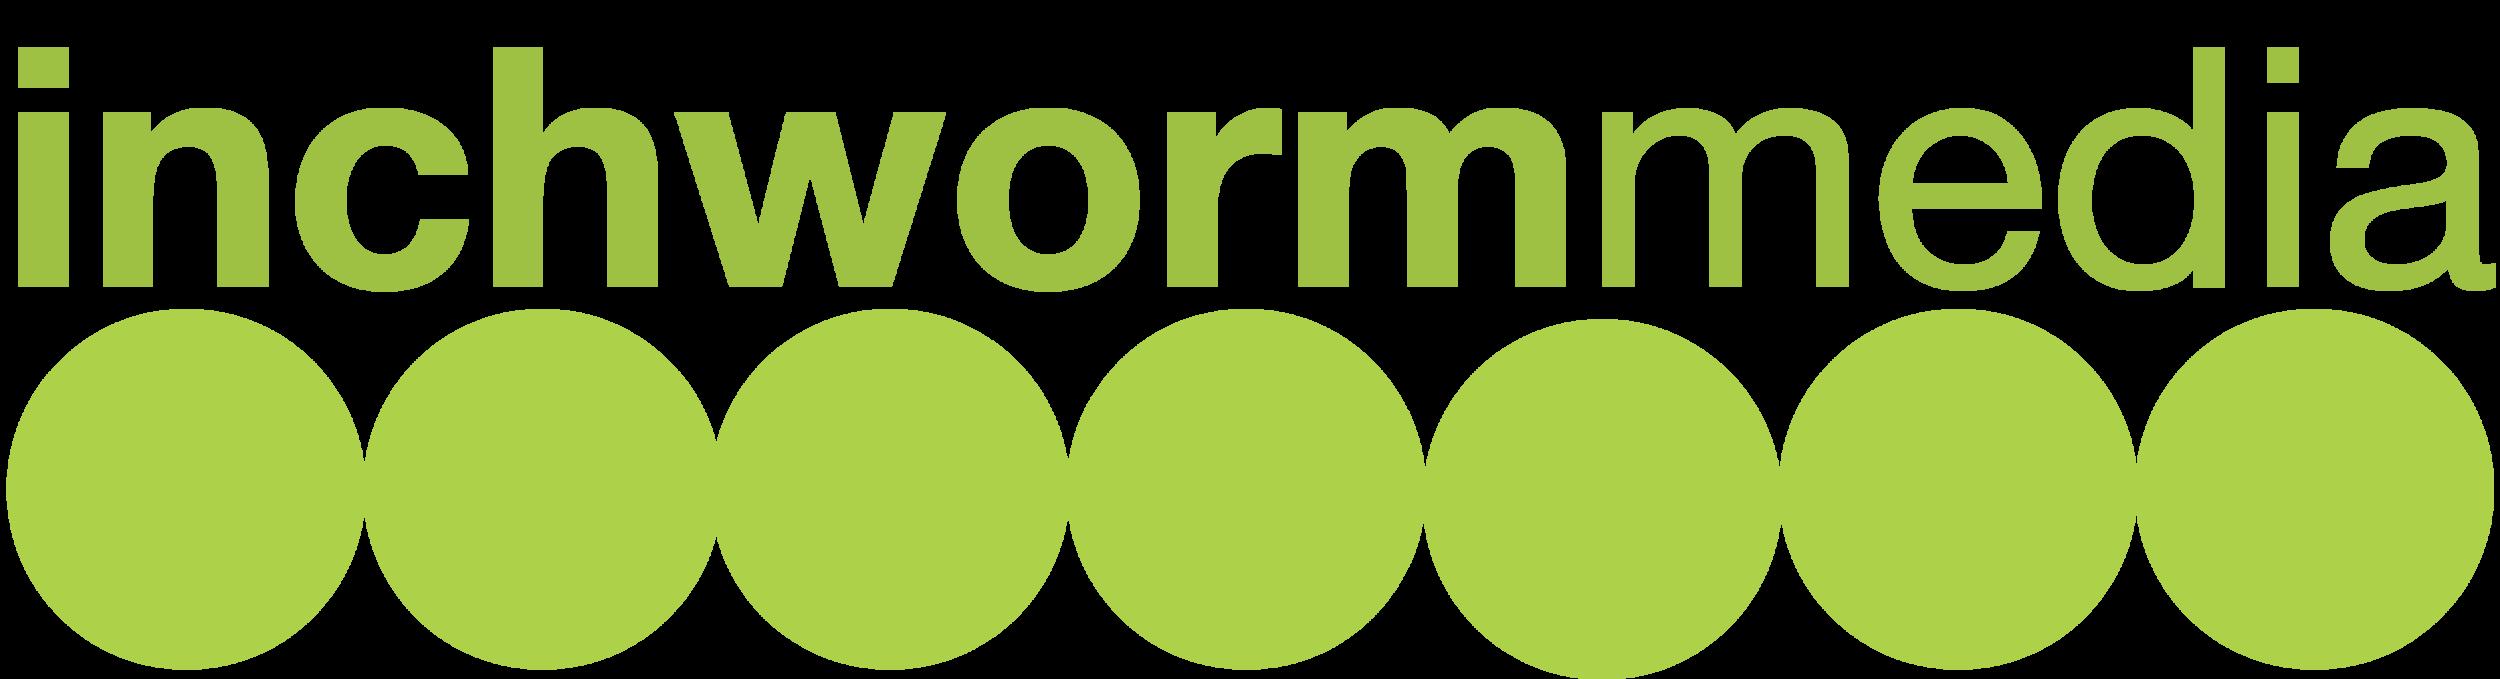 Inchworm_Logo.png